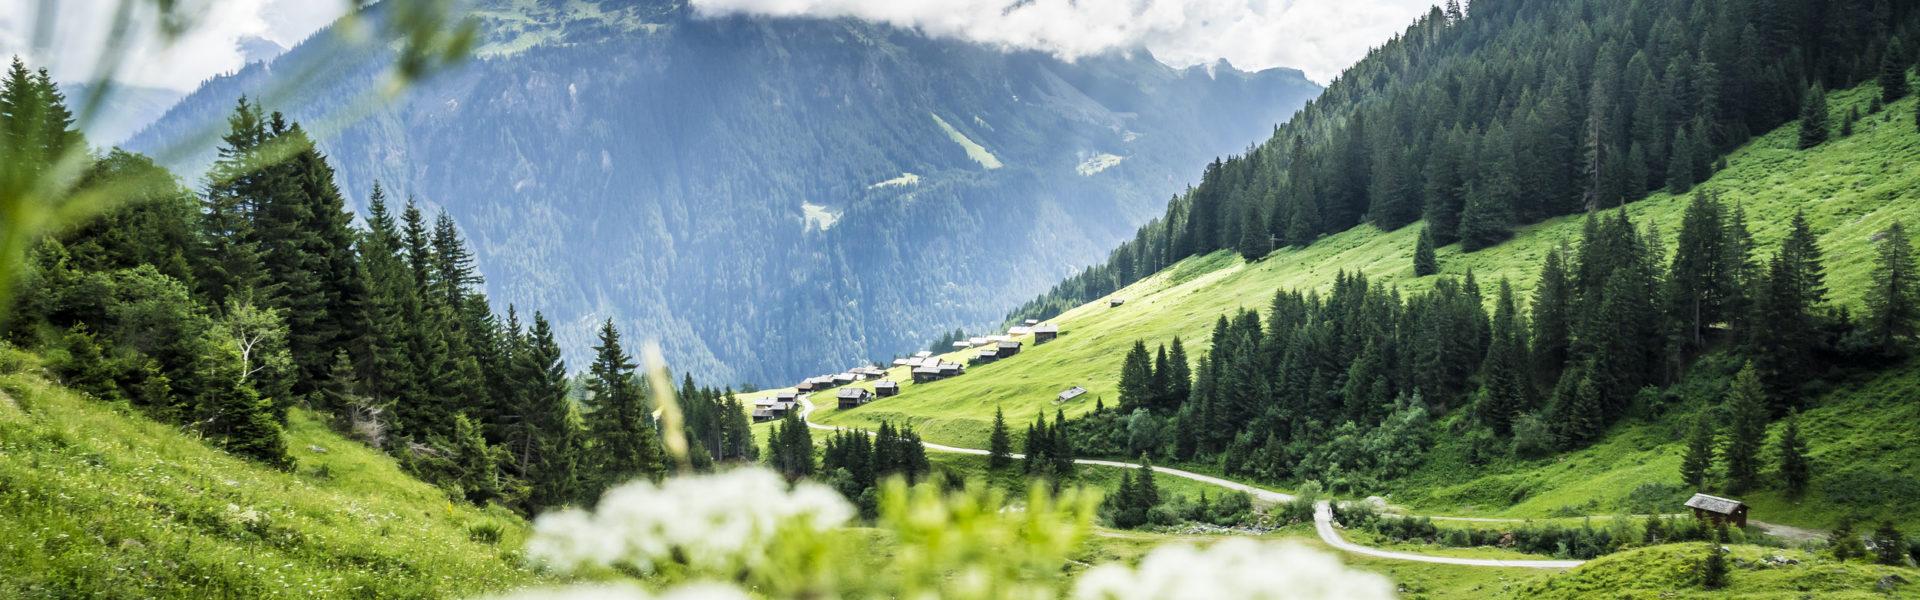 Garneratal Montafon © Dietmar Denger / Vorarlberg Tourismus